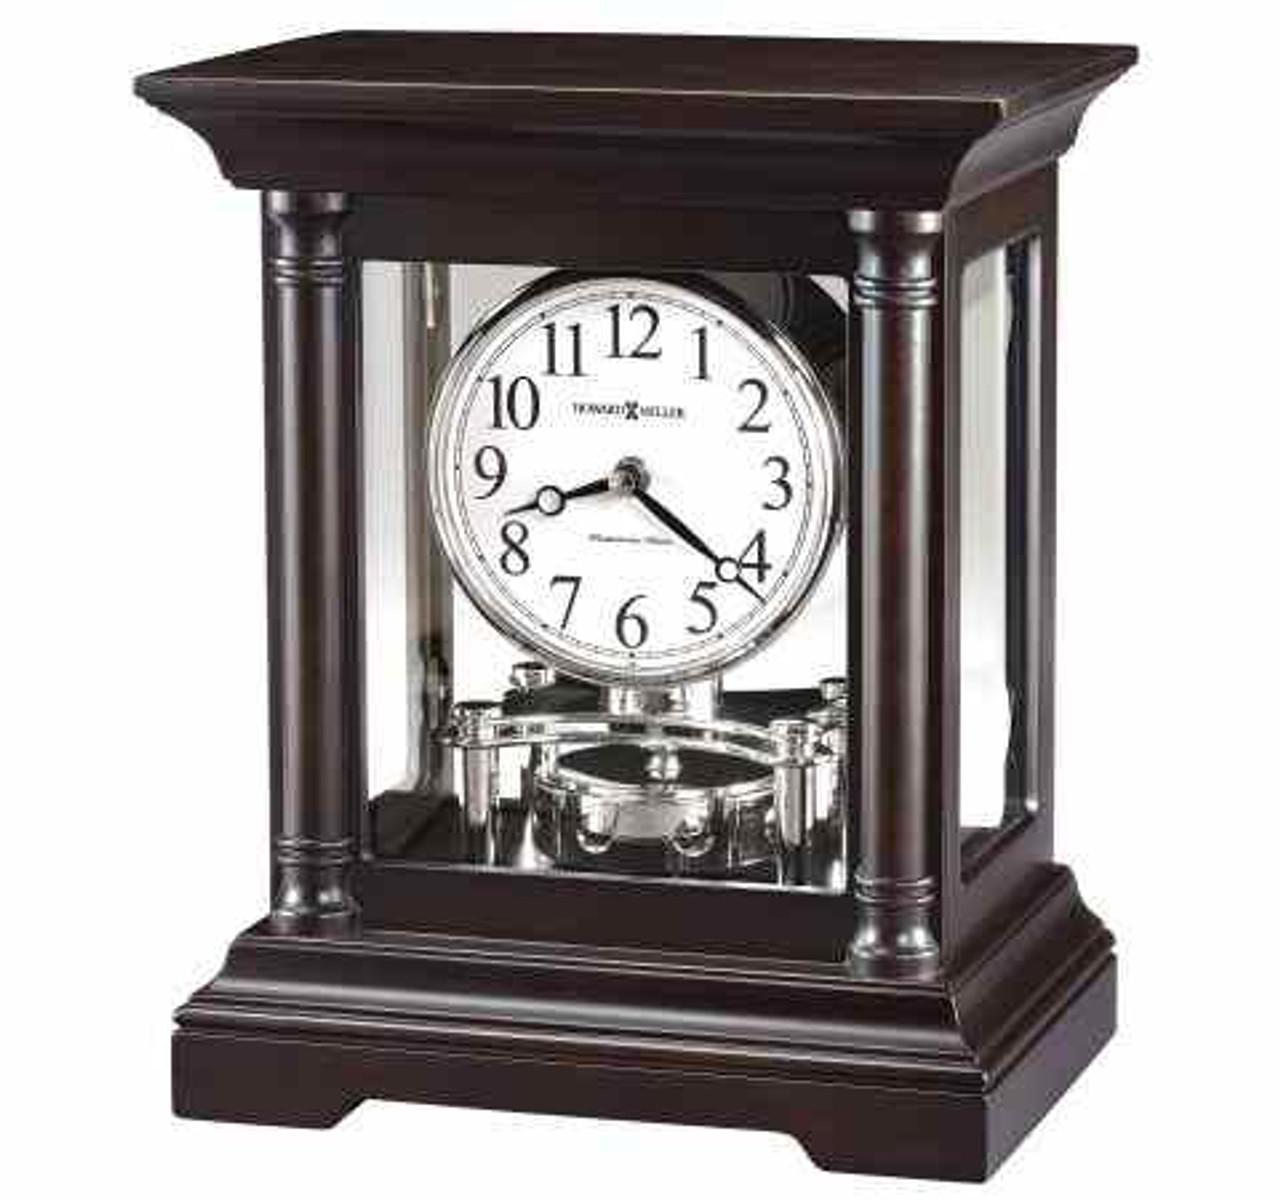 Small Mantel Clock